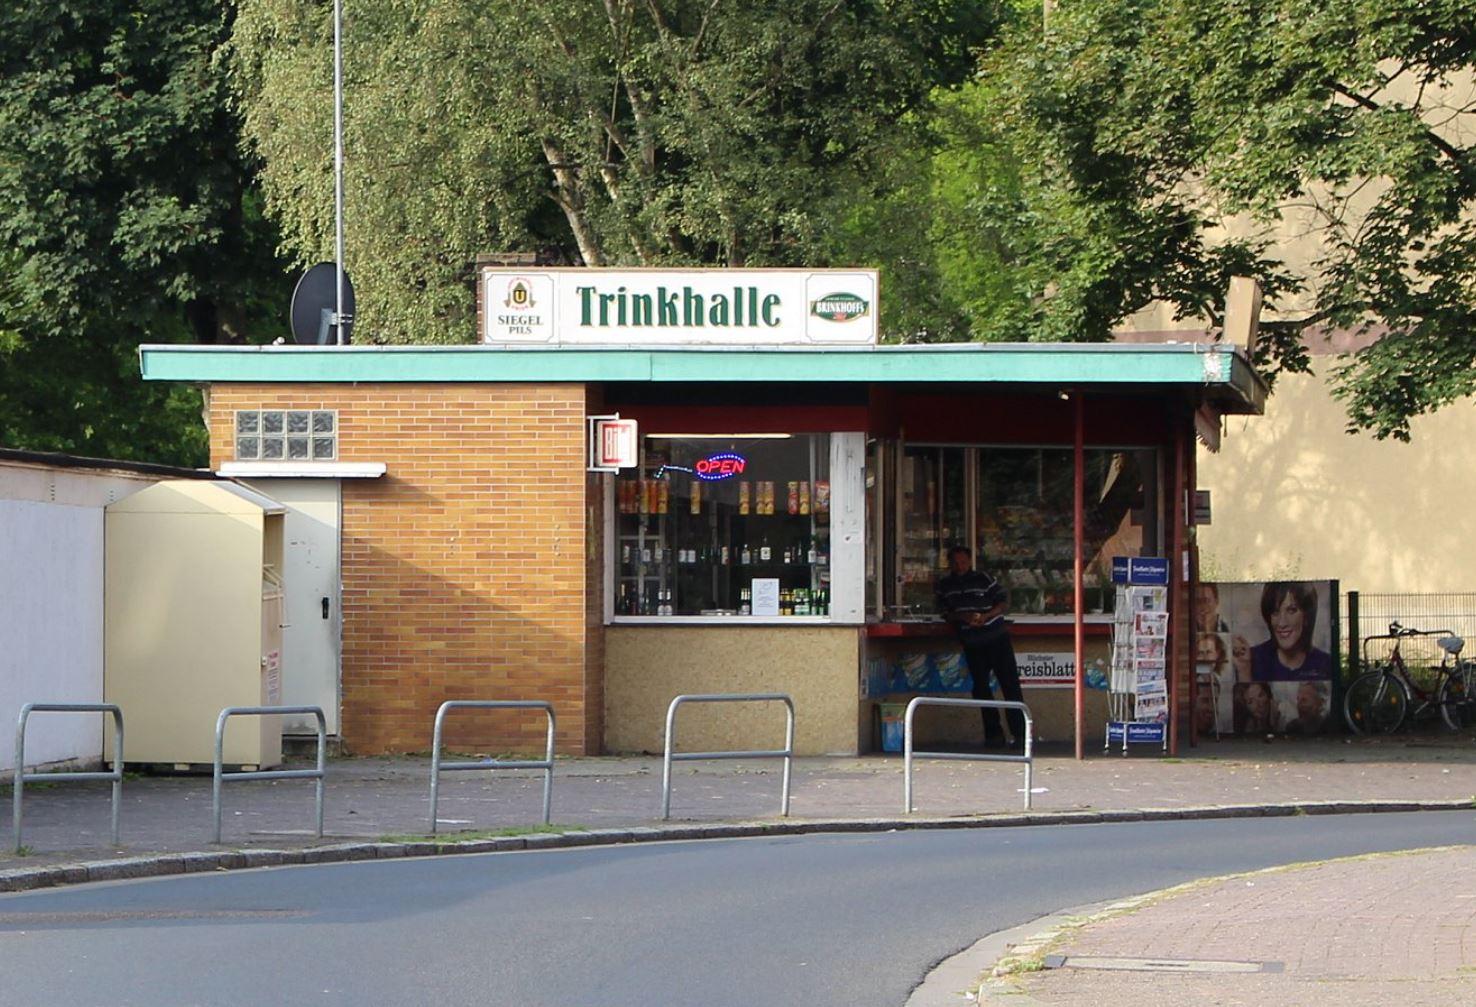 Dartturnier an der Hugo-Kallenbach-Straße